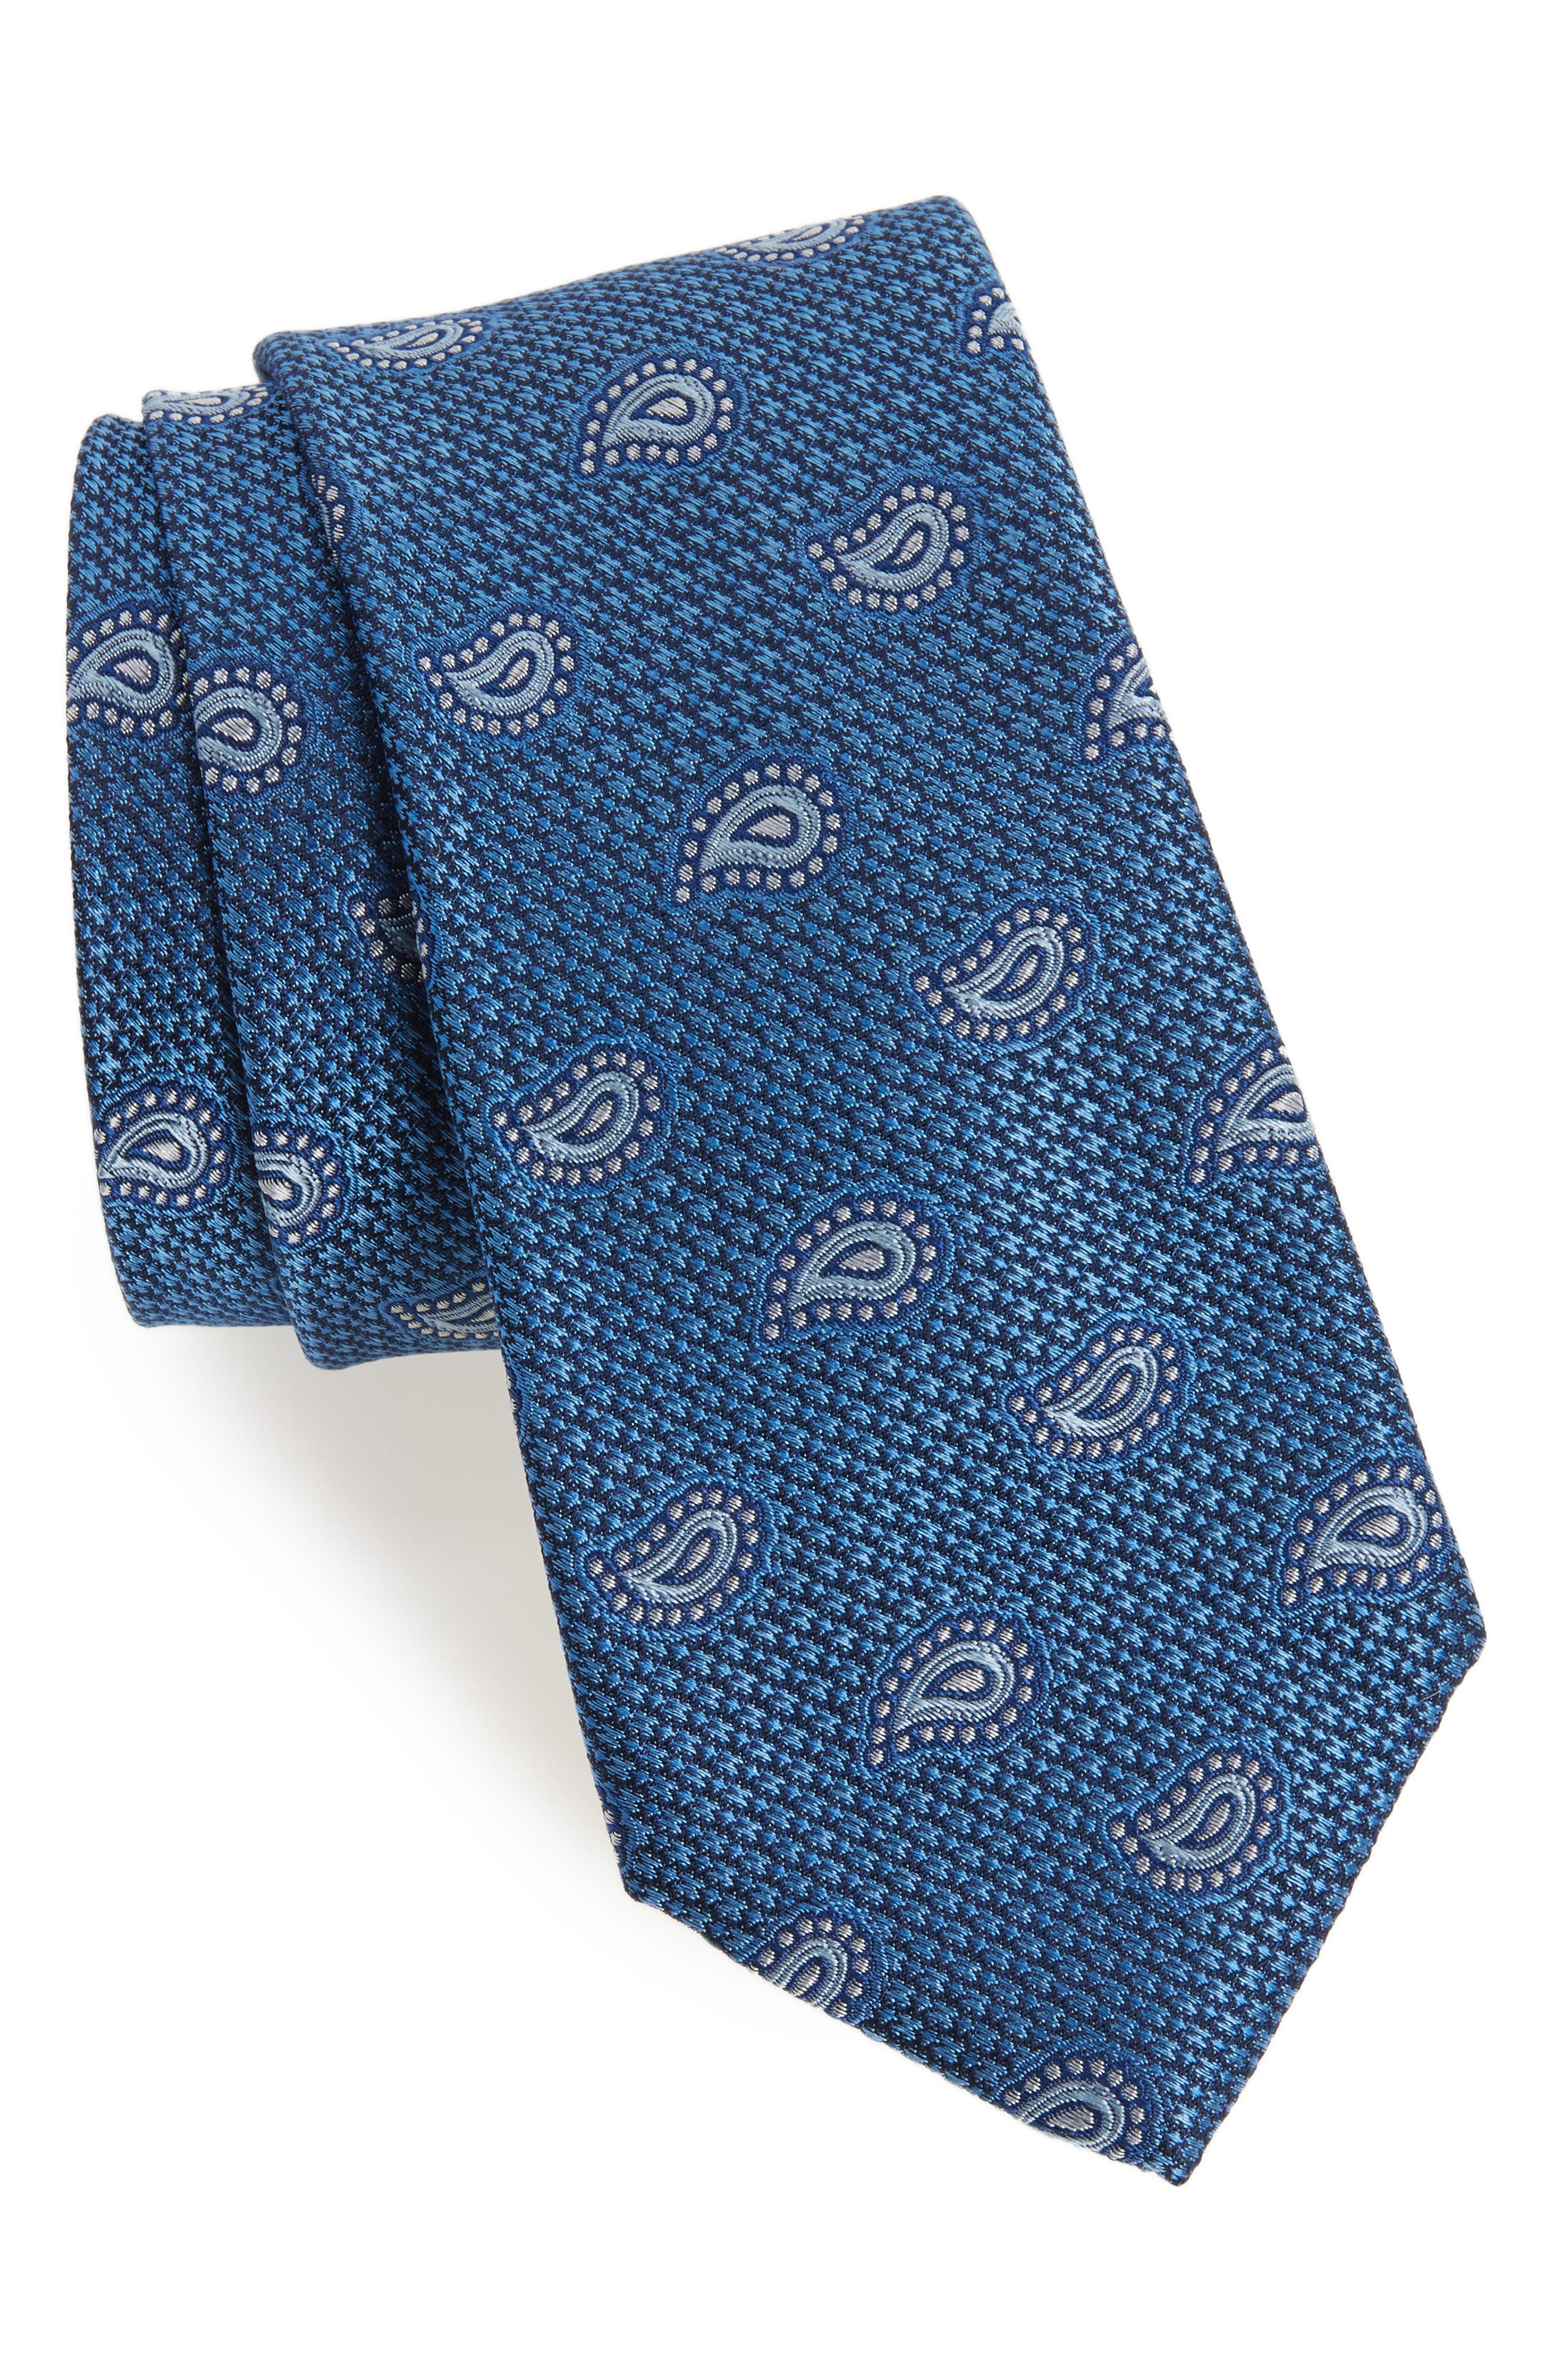 Alternate Image 1 Selected - Nordstrom Men's Shop Textured Pines Silk Tie